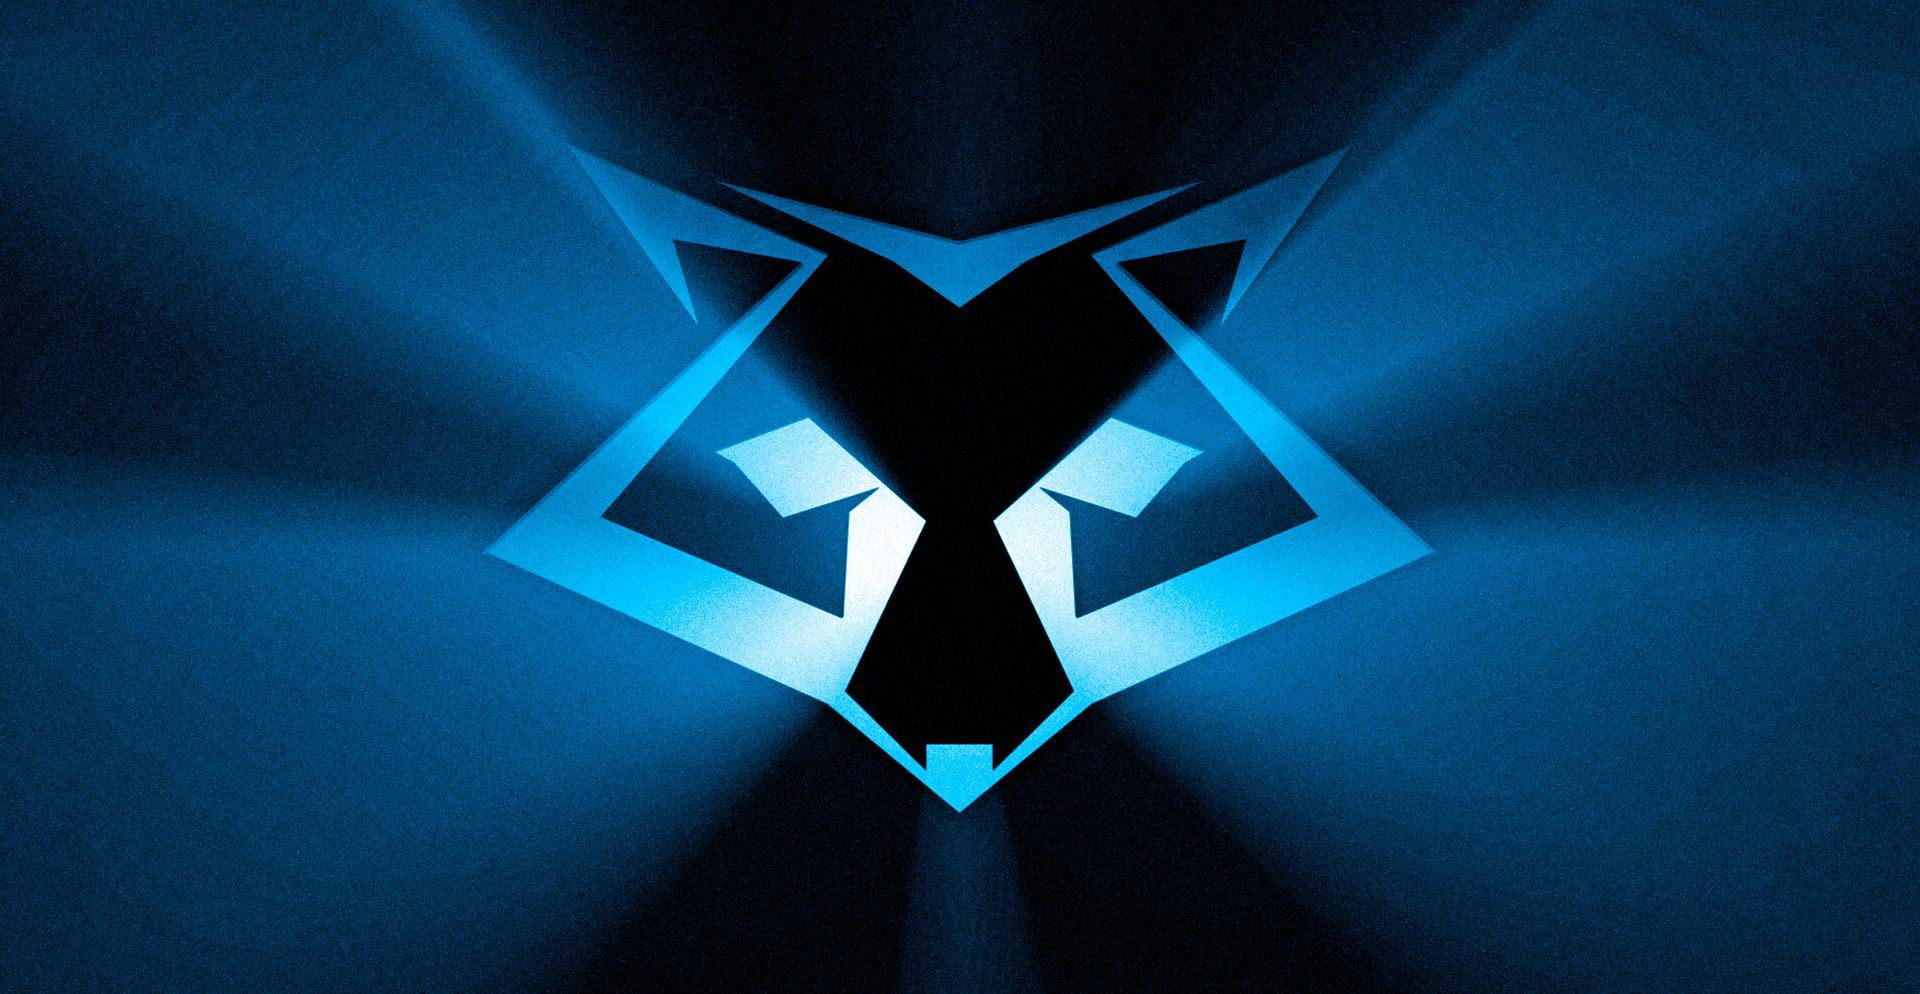 FOXY-A_02